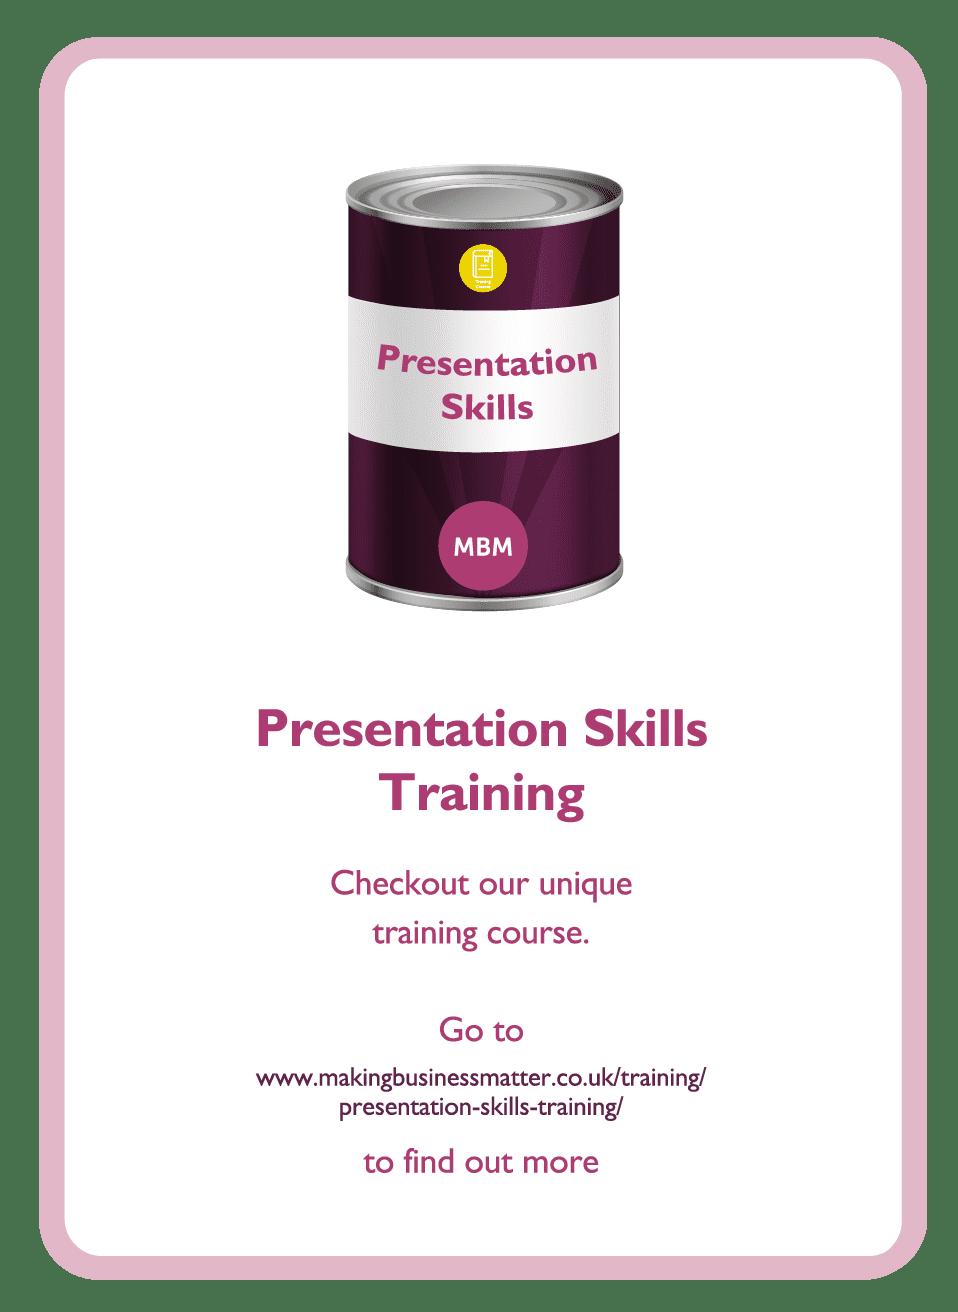 Coaching card titled Presentation skills training